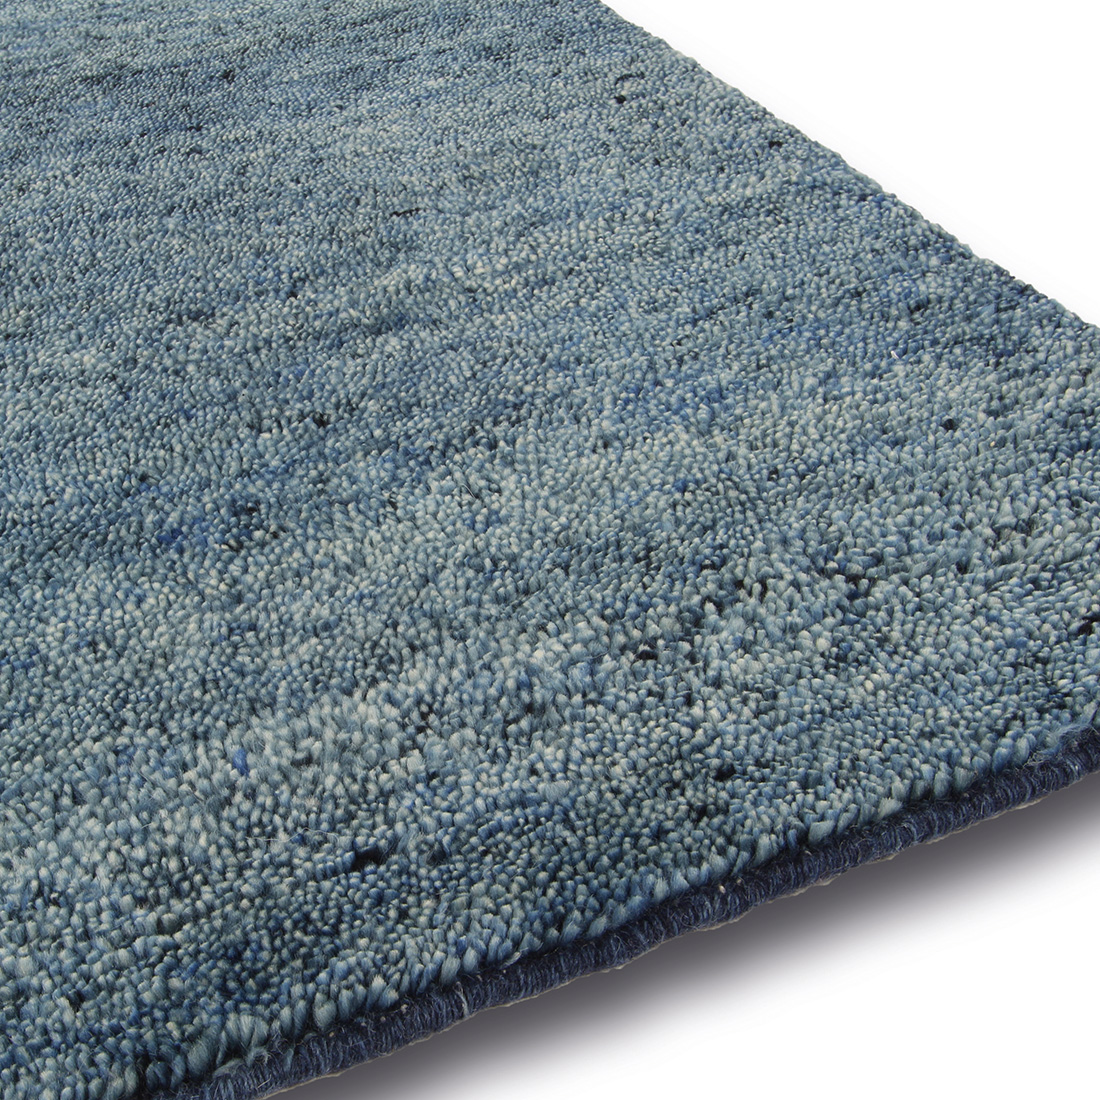 Vloerkleed Brinker Mateo Blue | 200 x 300 cm